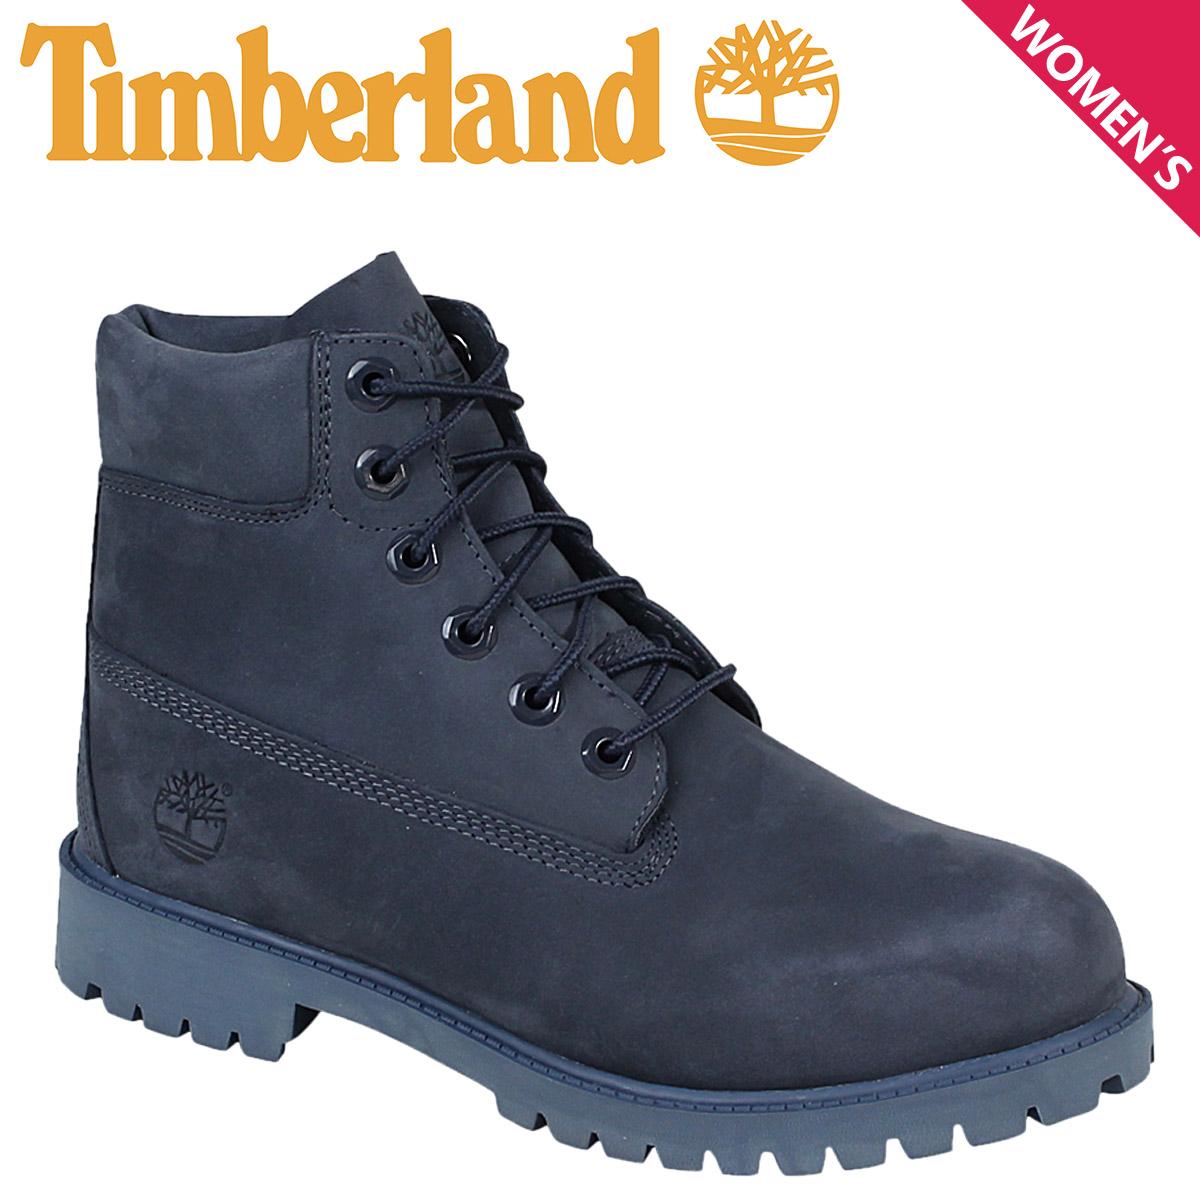 Women s Timberland Timberland 6 INCHI 6 inch premium boots JUNIOR 6-INCH  PREMIUM WATERPROOF BOOTS A171S W wise waterproof Navy 51e78f047b89